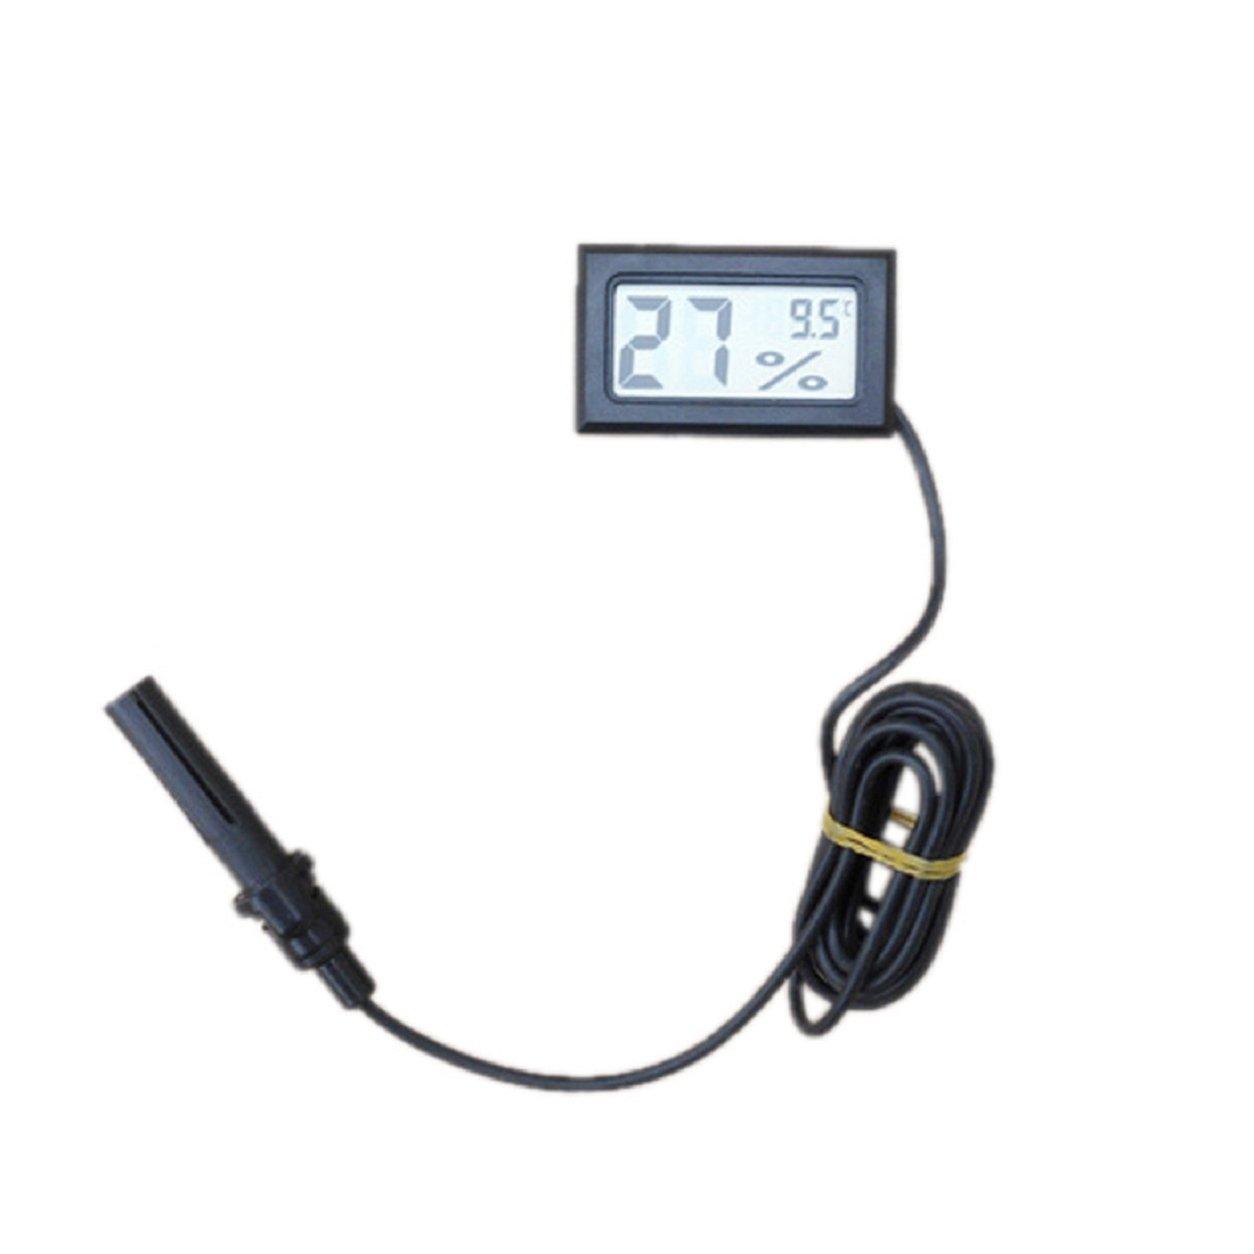 Malloom® Mini Termó metro higró metro Meter Digital Pantalla LCD Negro Malloom®